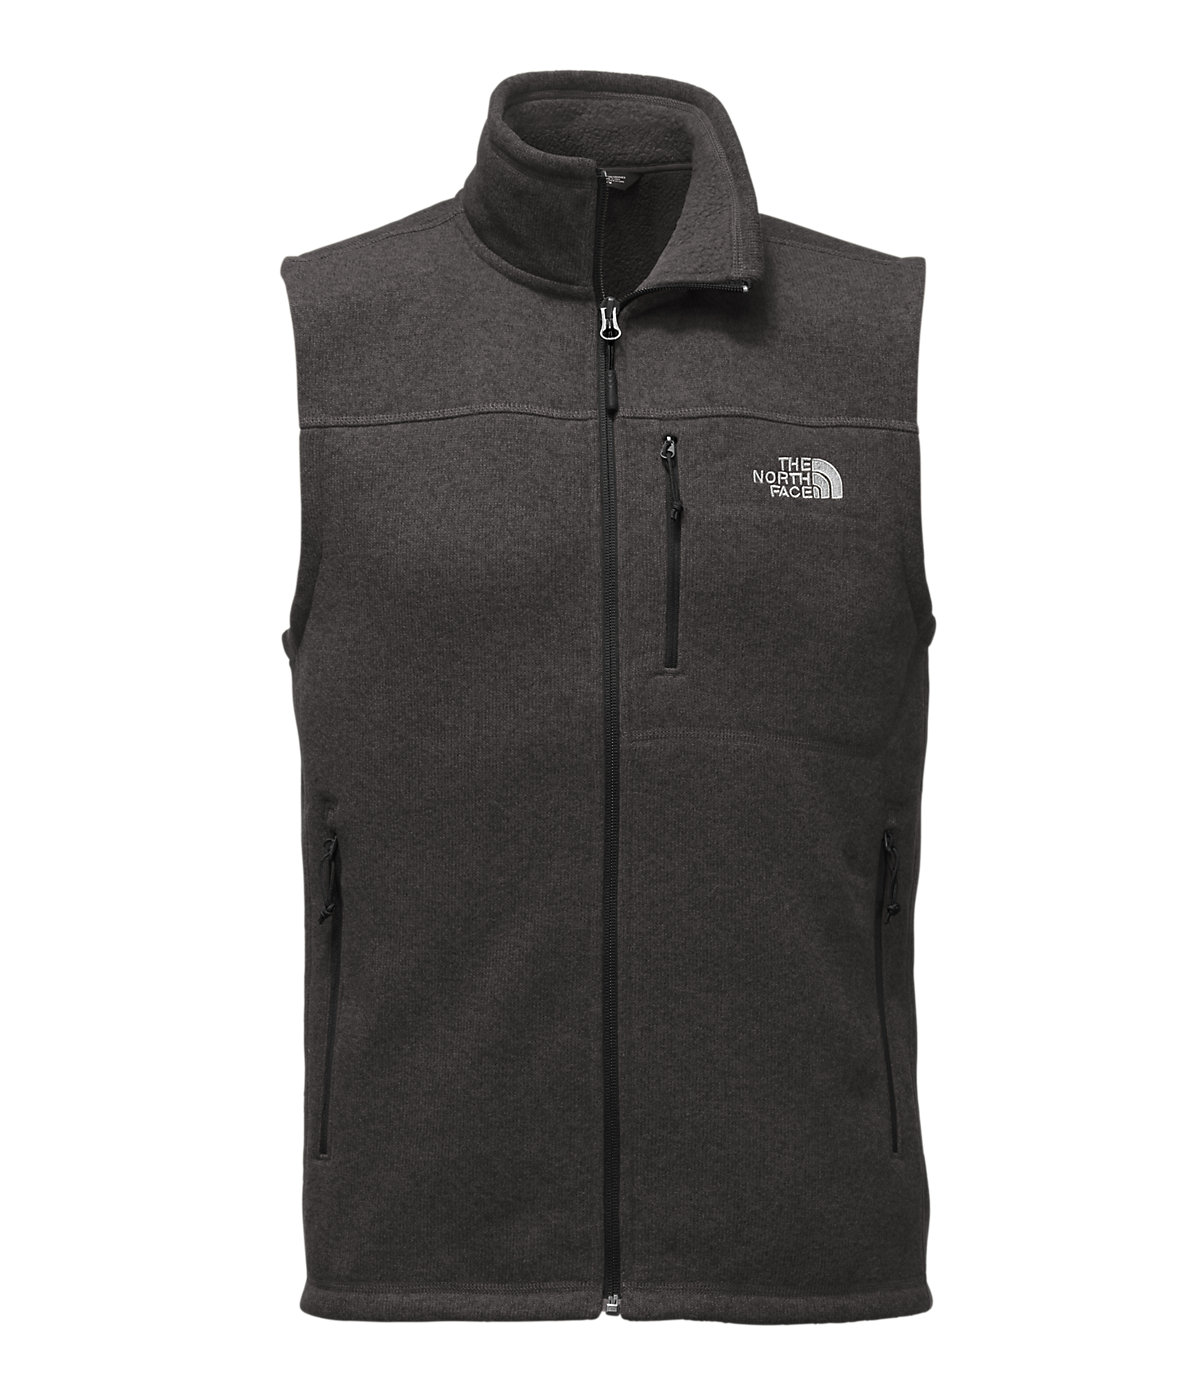 969c0e027 north face mens gordon lyons vest usa